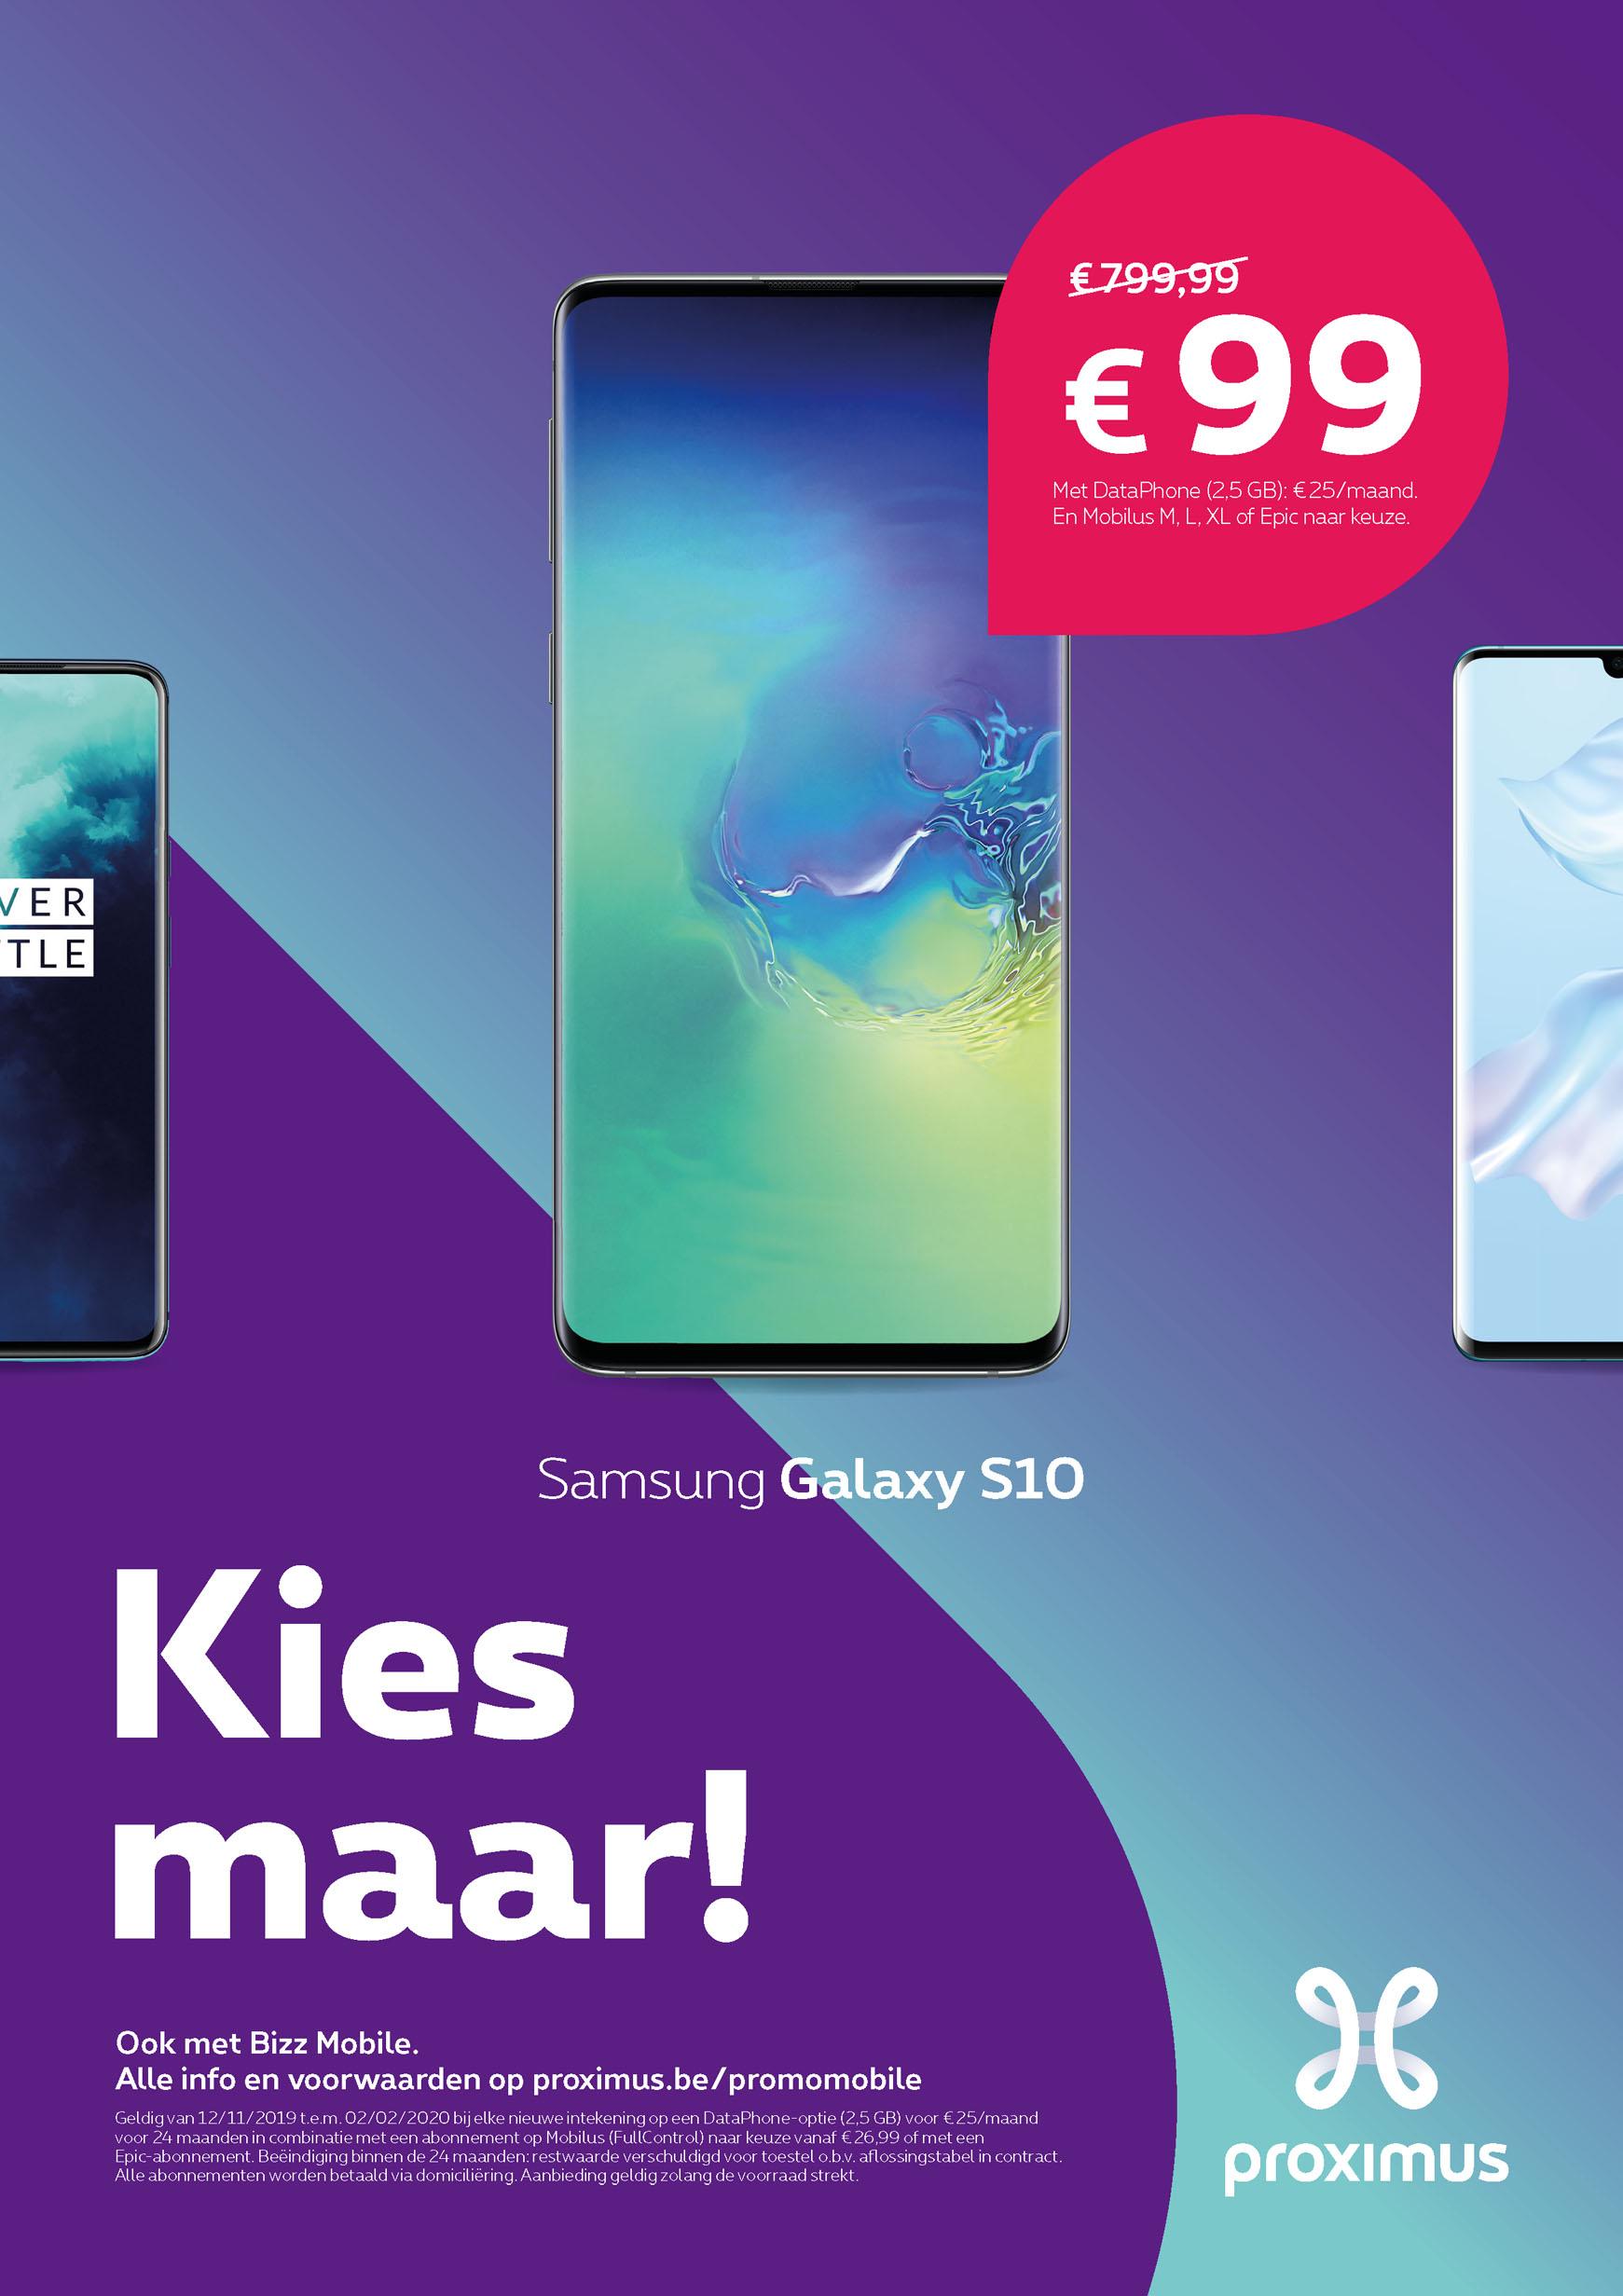 Promotions_JO_JO_Samsung_Galaxy_S10_2019